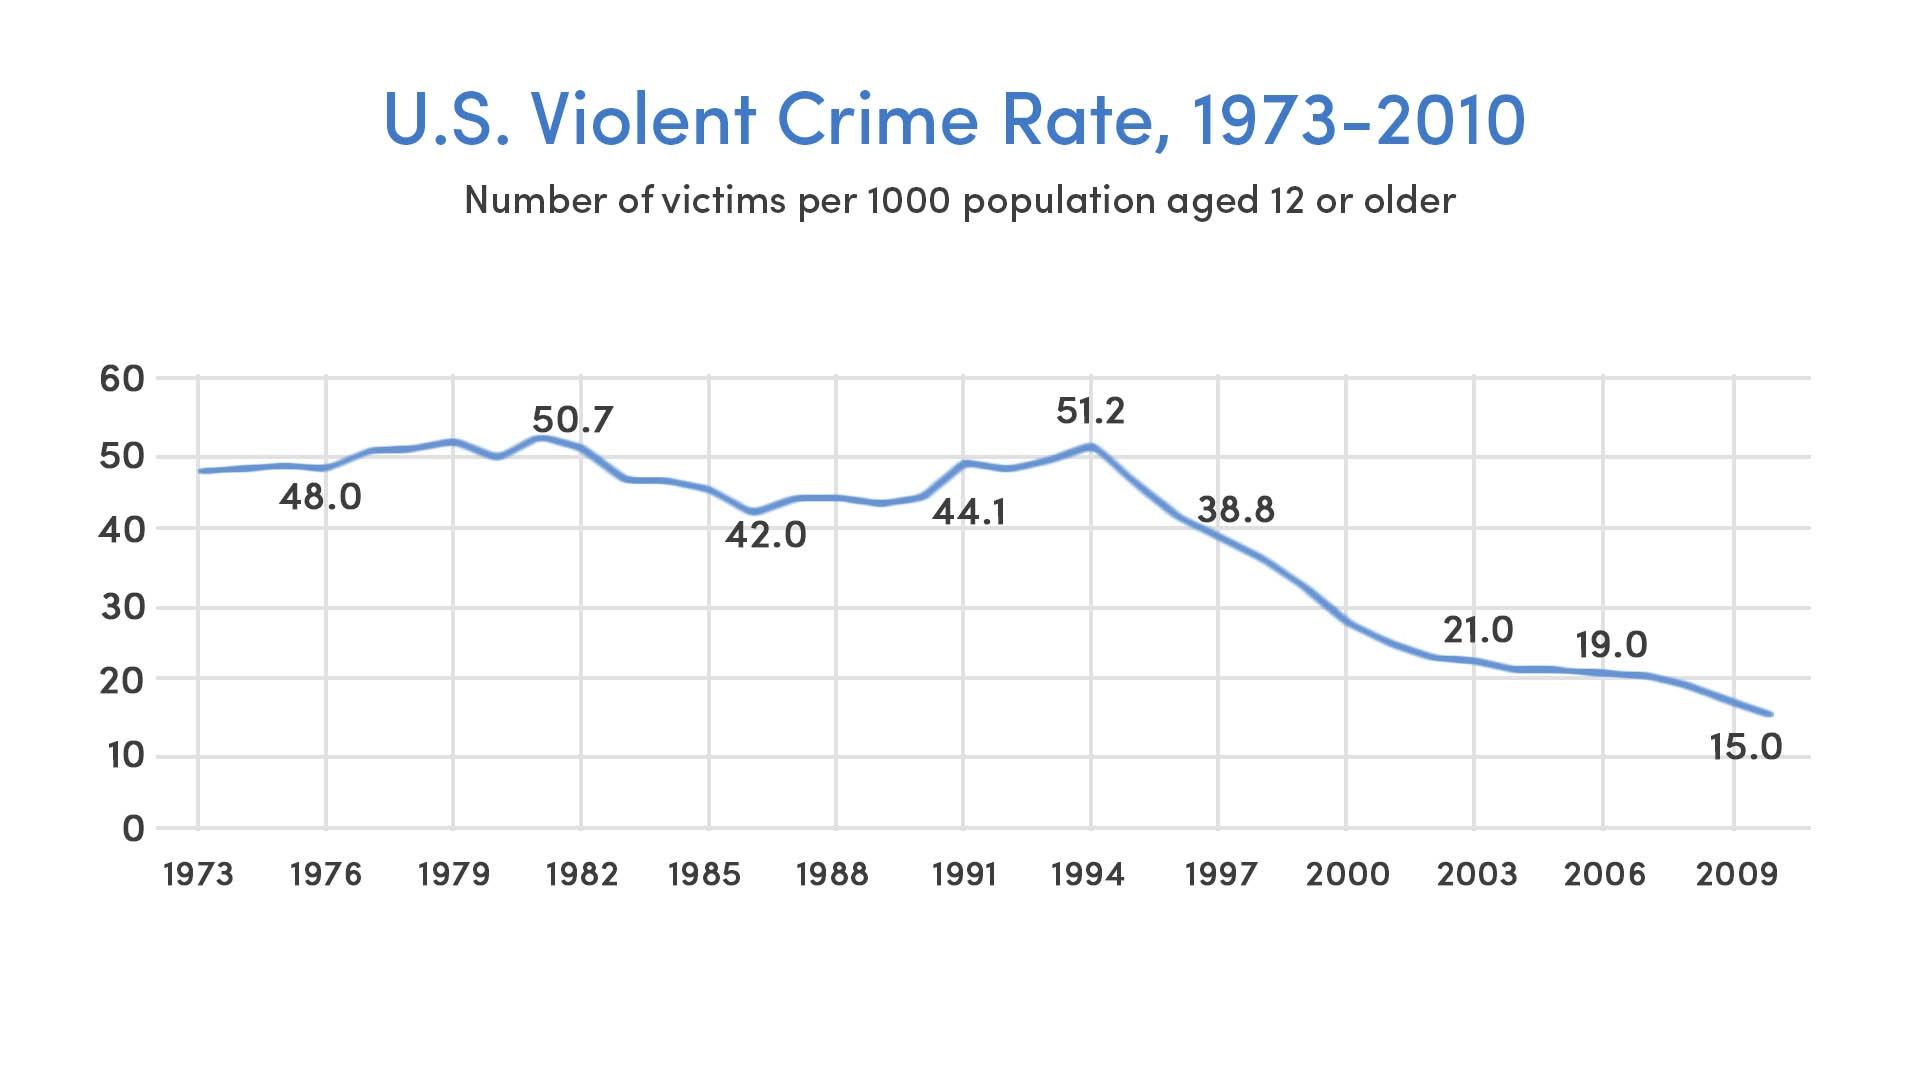 U.S. Violent Crime